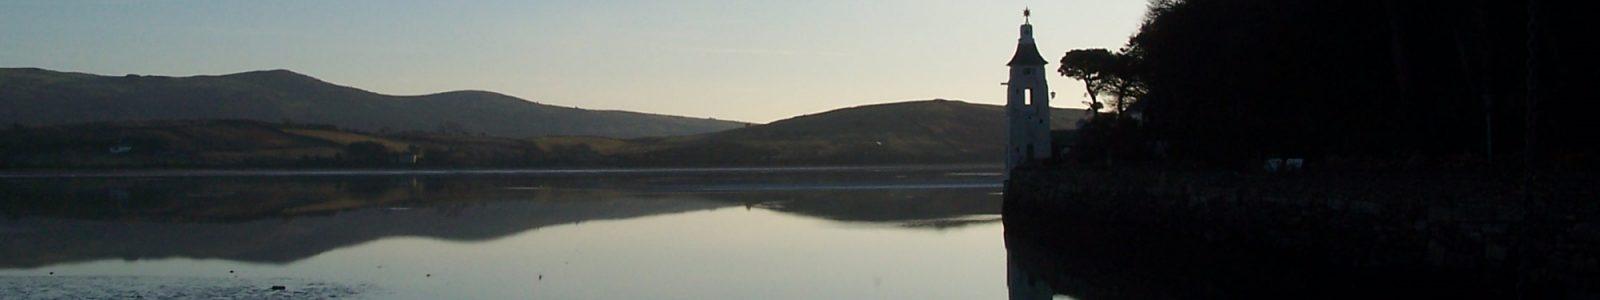 Portmeirion at twilight - Snowdonia Caravan Park Llwyn Bugeilydd